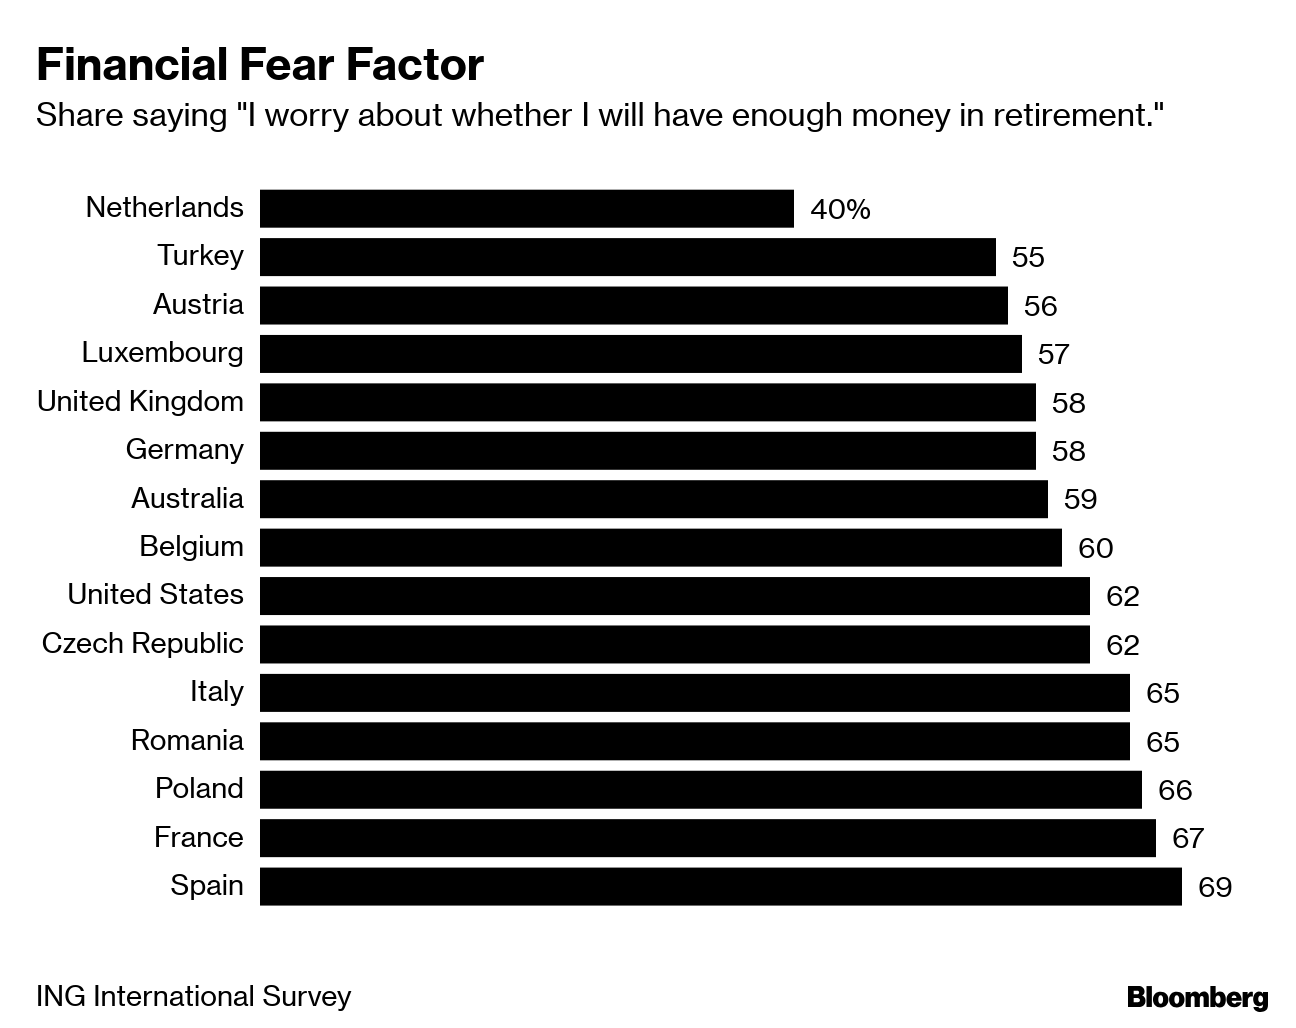 Financial Fear Factor